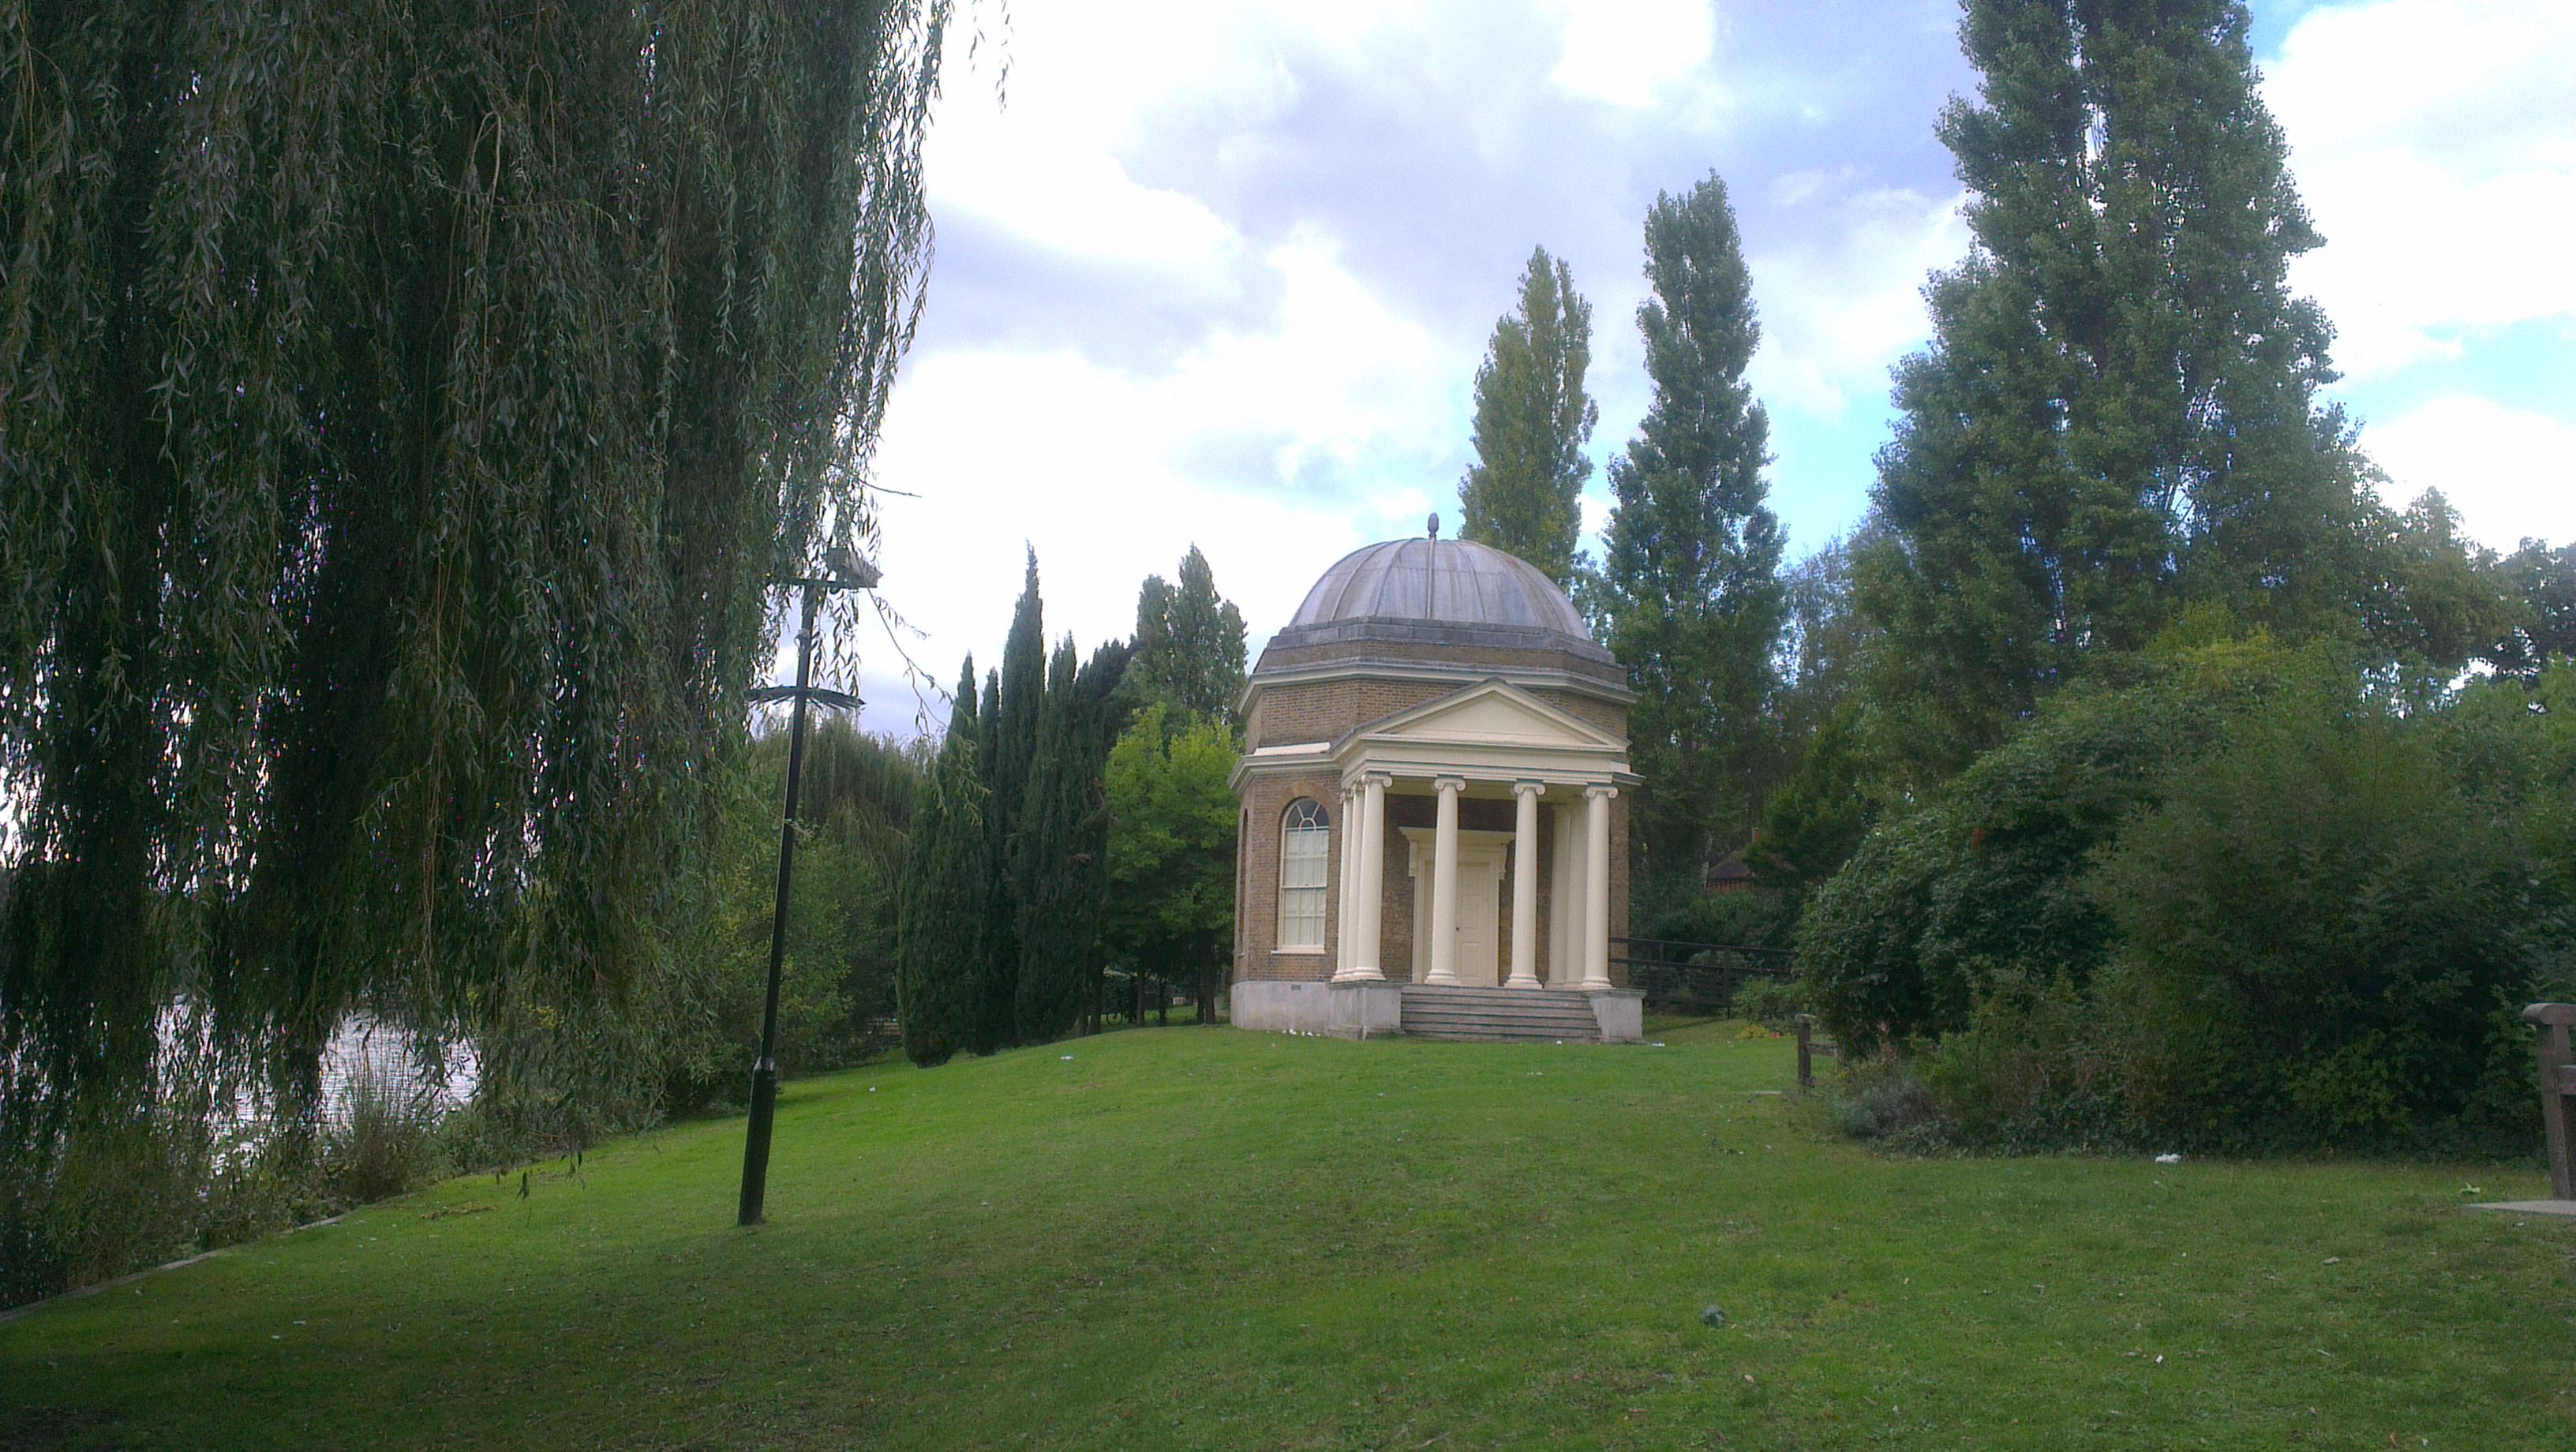 Garrick's Temple to Shakespeare in Hampton